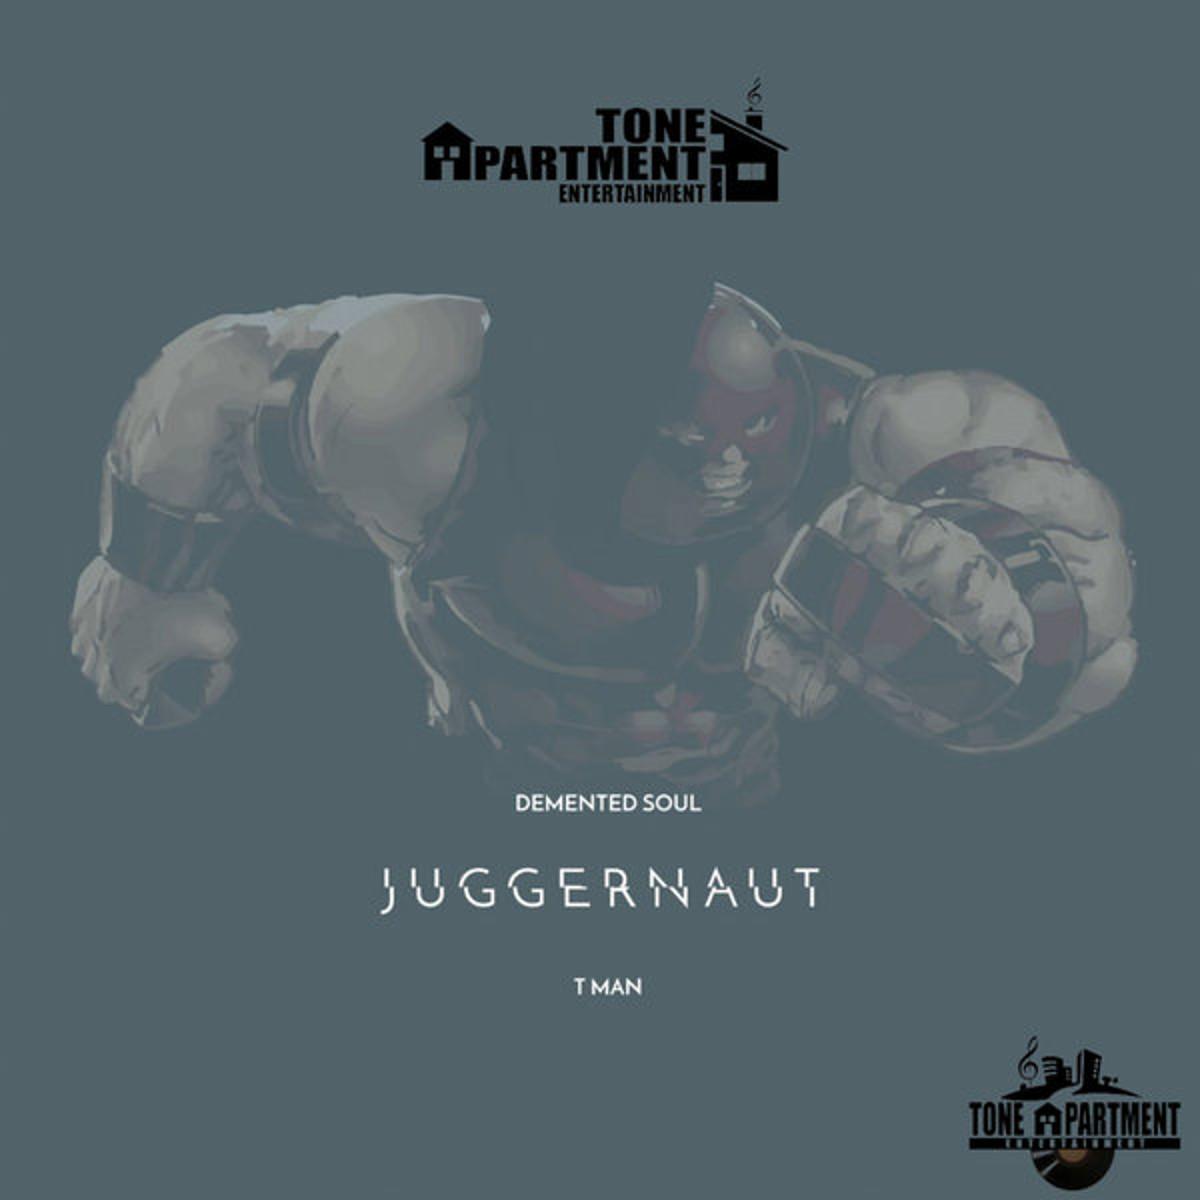 Demented Soul & Tman - Juggernaut EP